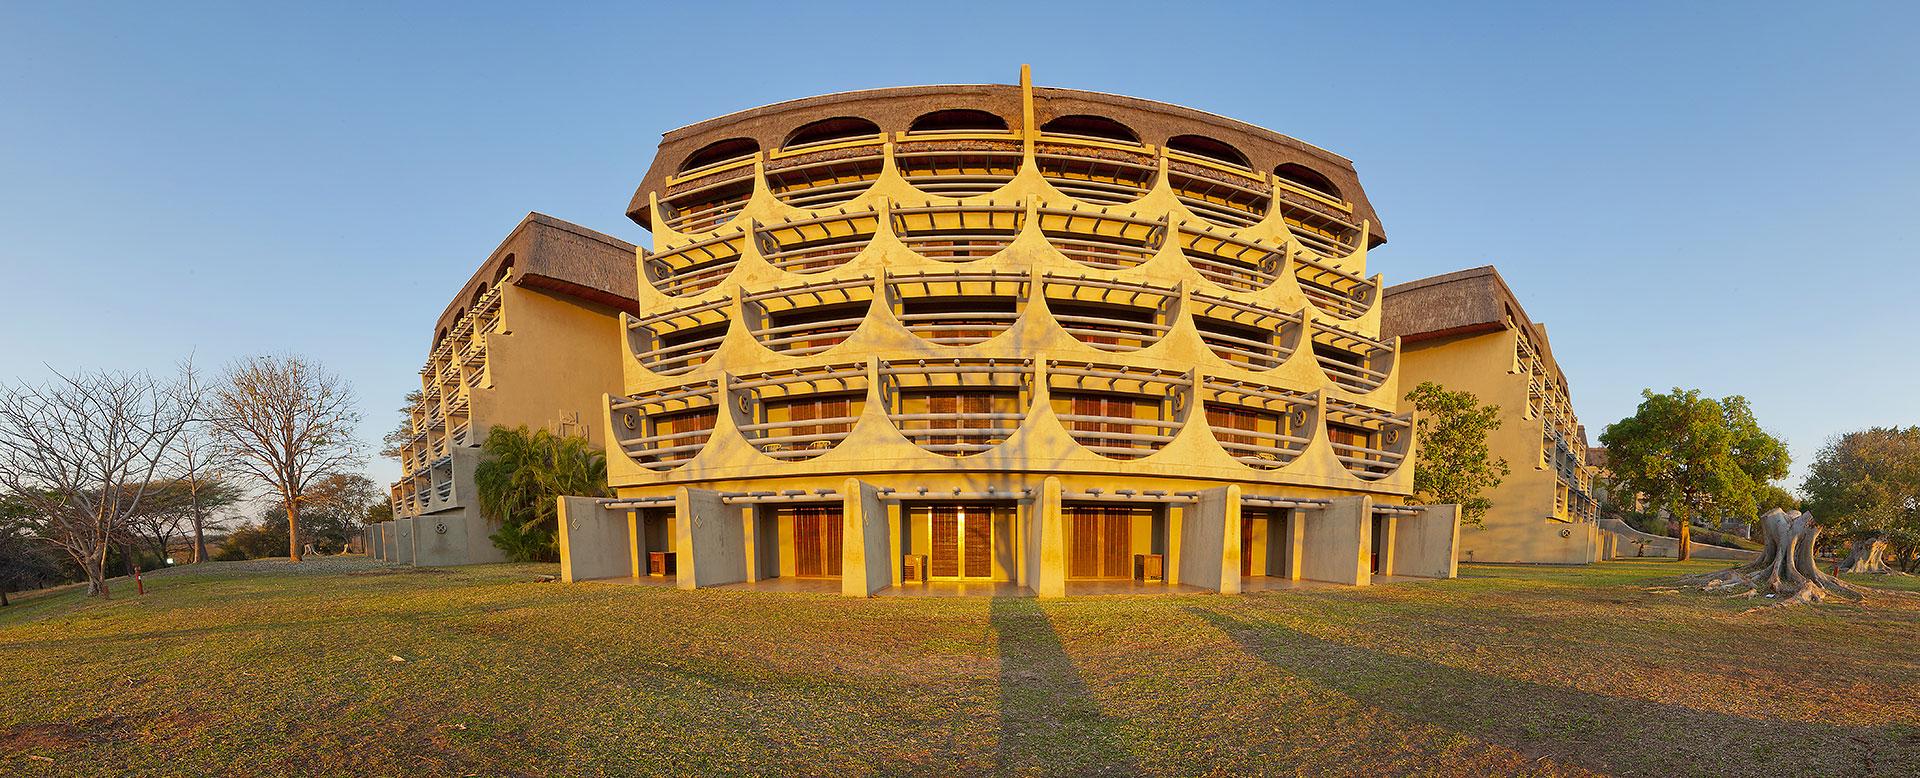 Zimbabwe 5 Star Golf Luxushotel Simbabwe Sterne Luxury Hotel Booking Hotels Collection